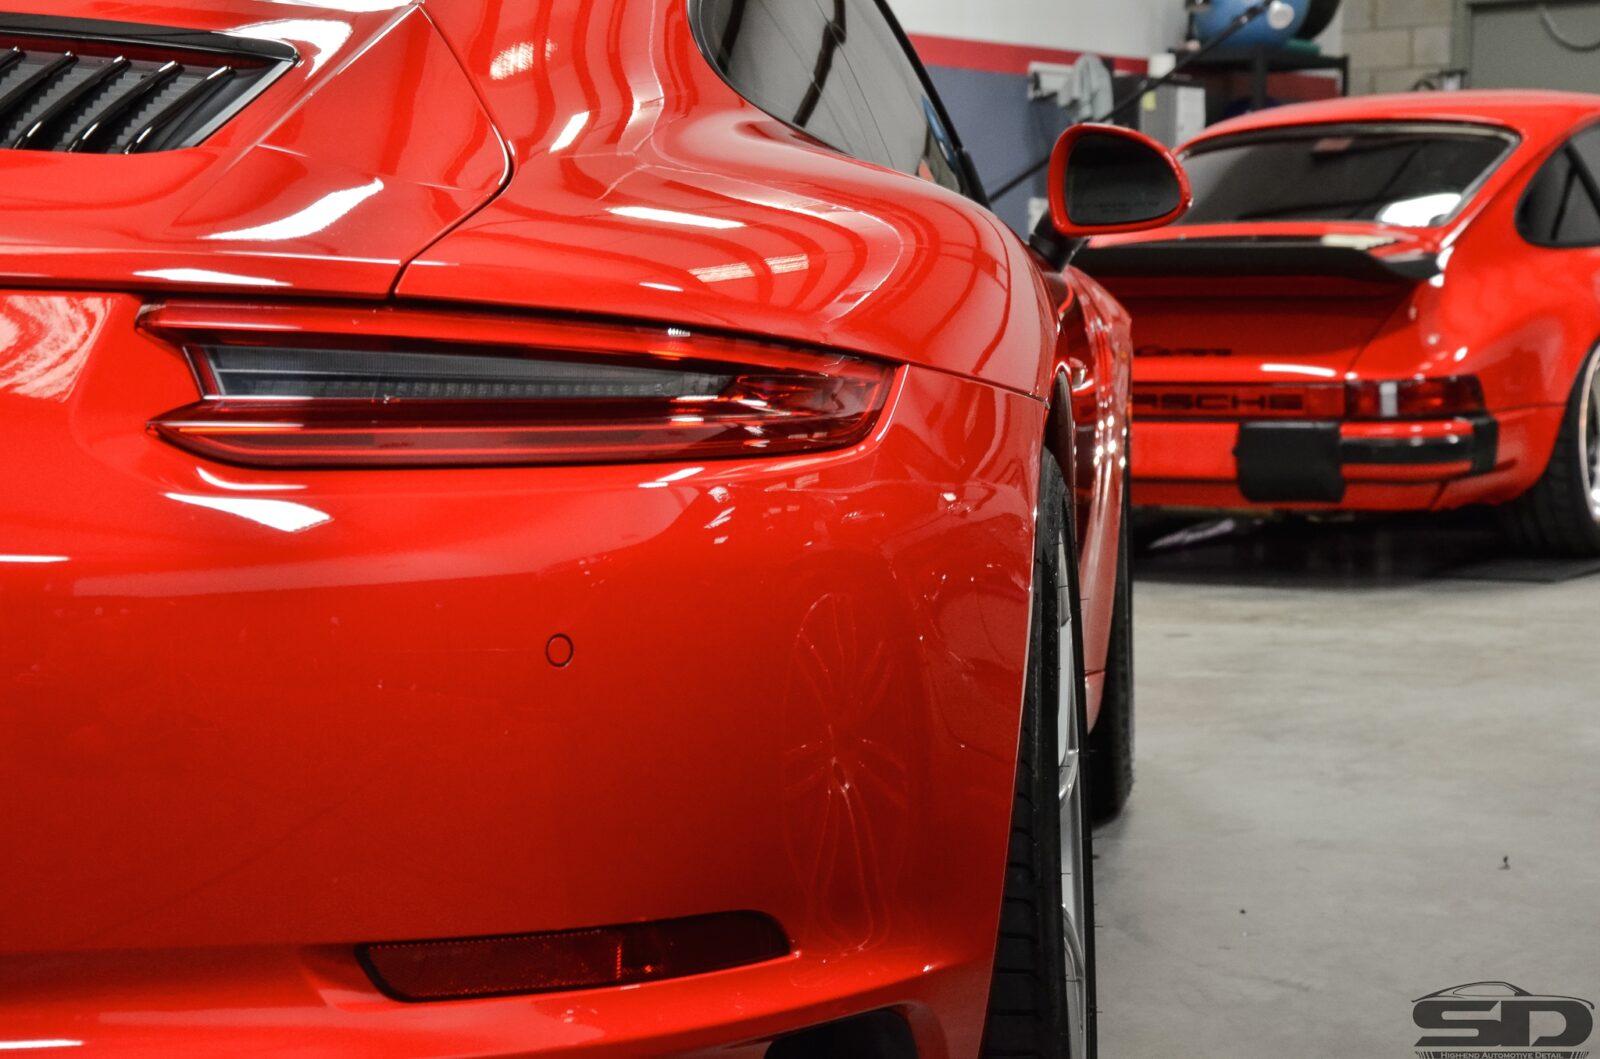 For the Love of Porsche! - Auto Detailing Orlando